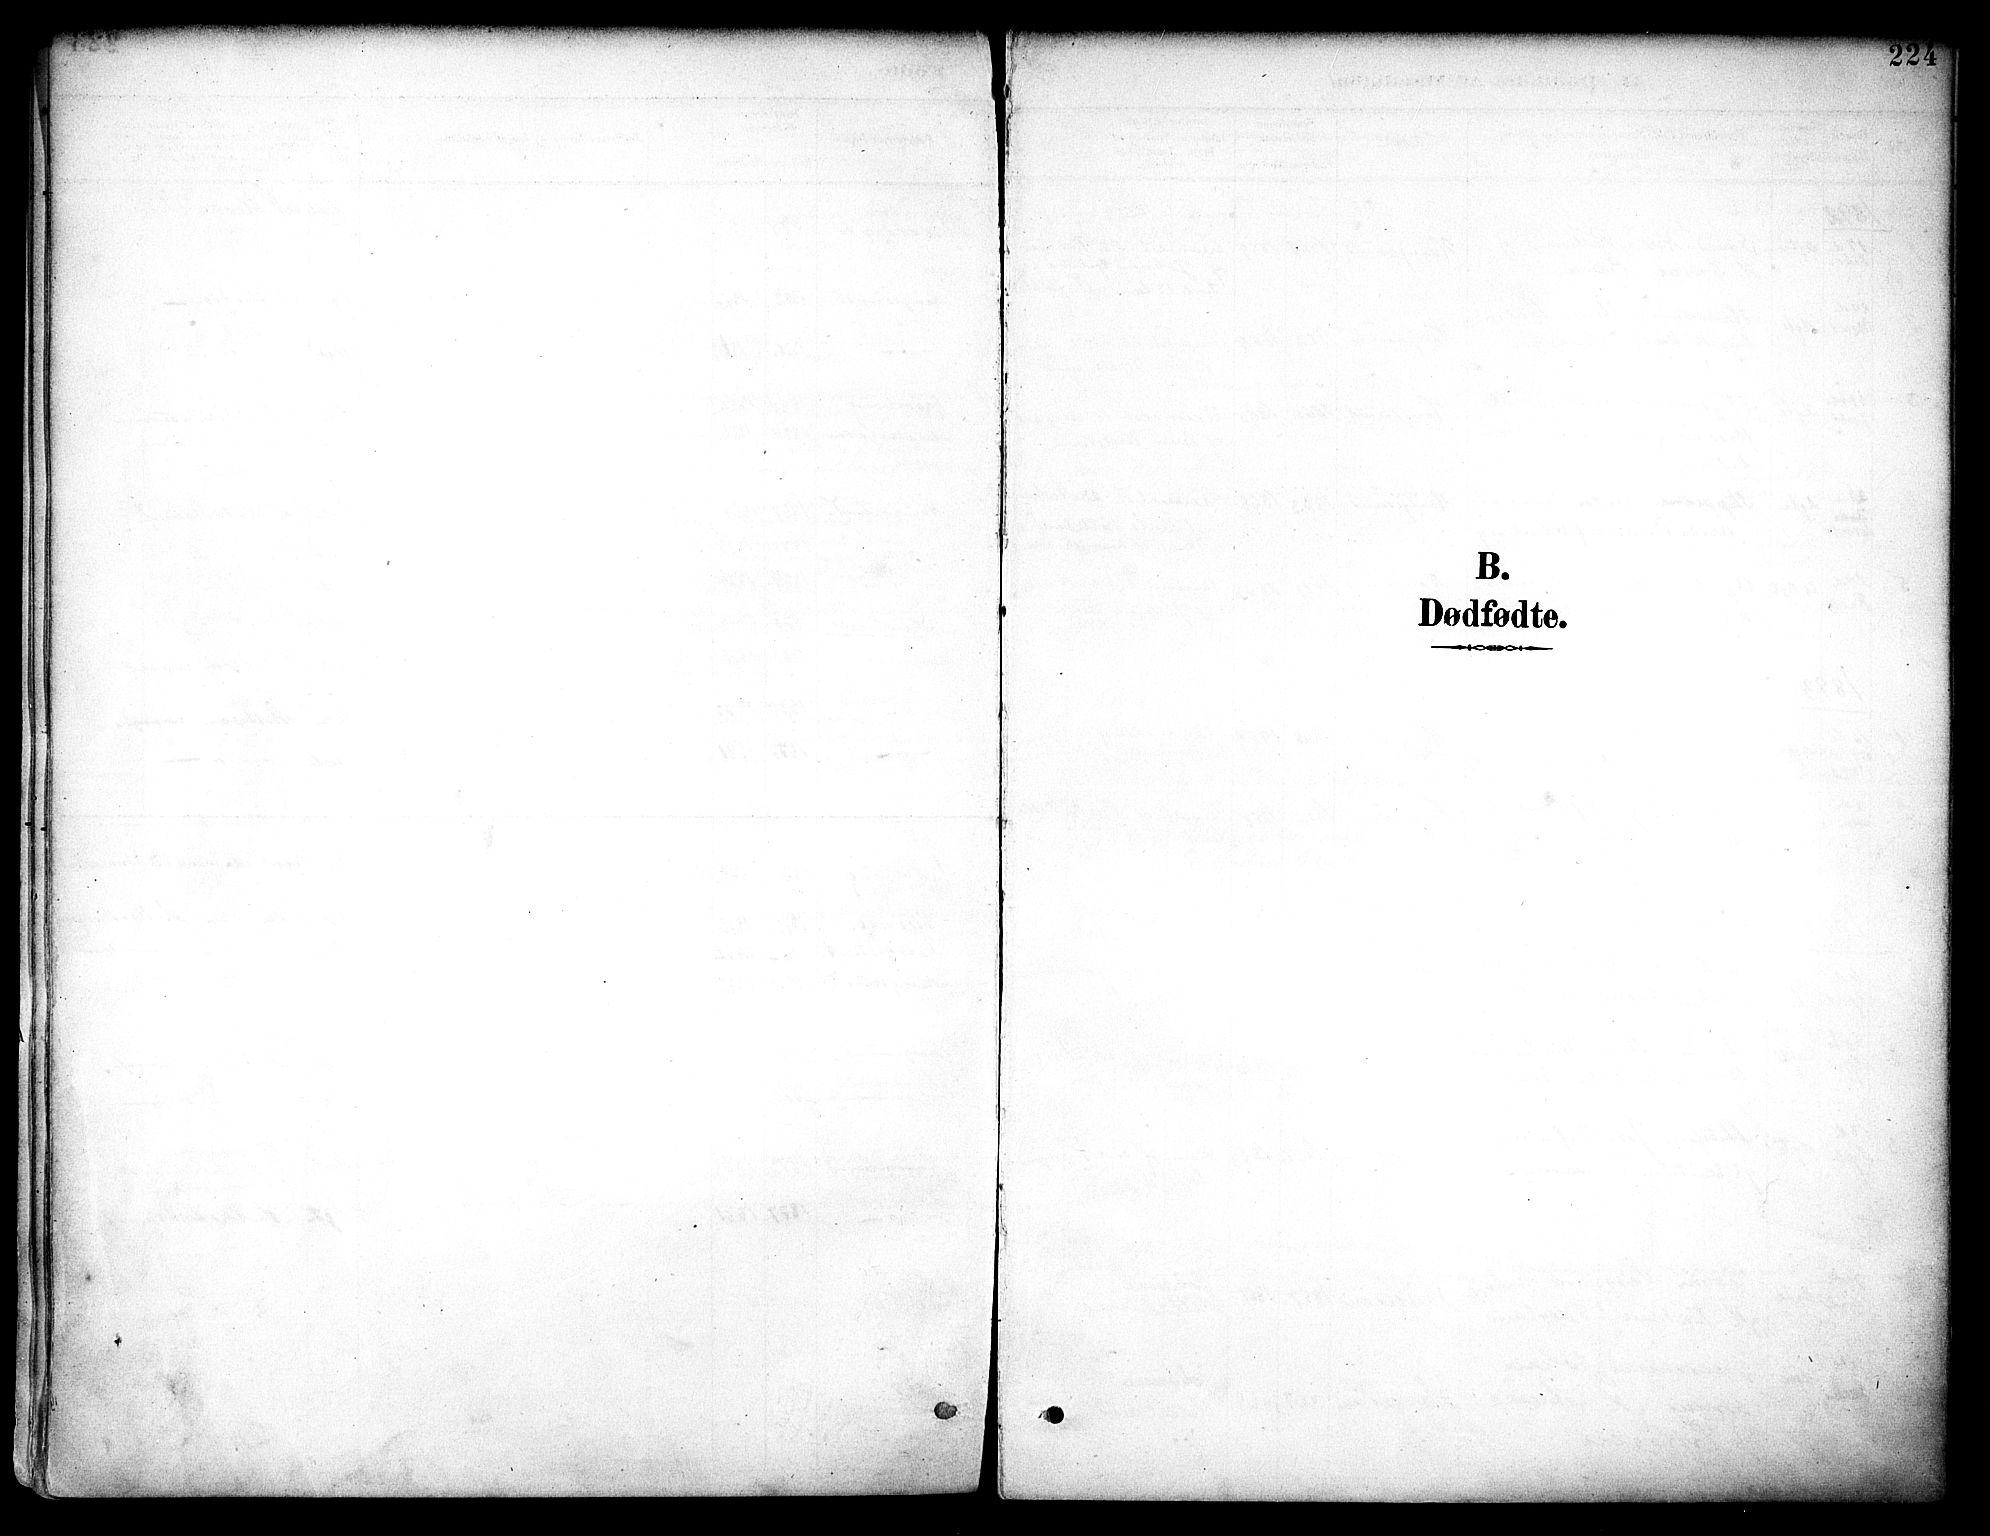 SAST, Haugesund sokneprestkontor, H/Ha/Haa/L0006: Ministerialbok nr. A 6, 1891-1907, s. 224